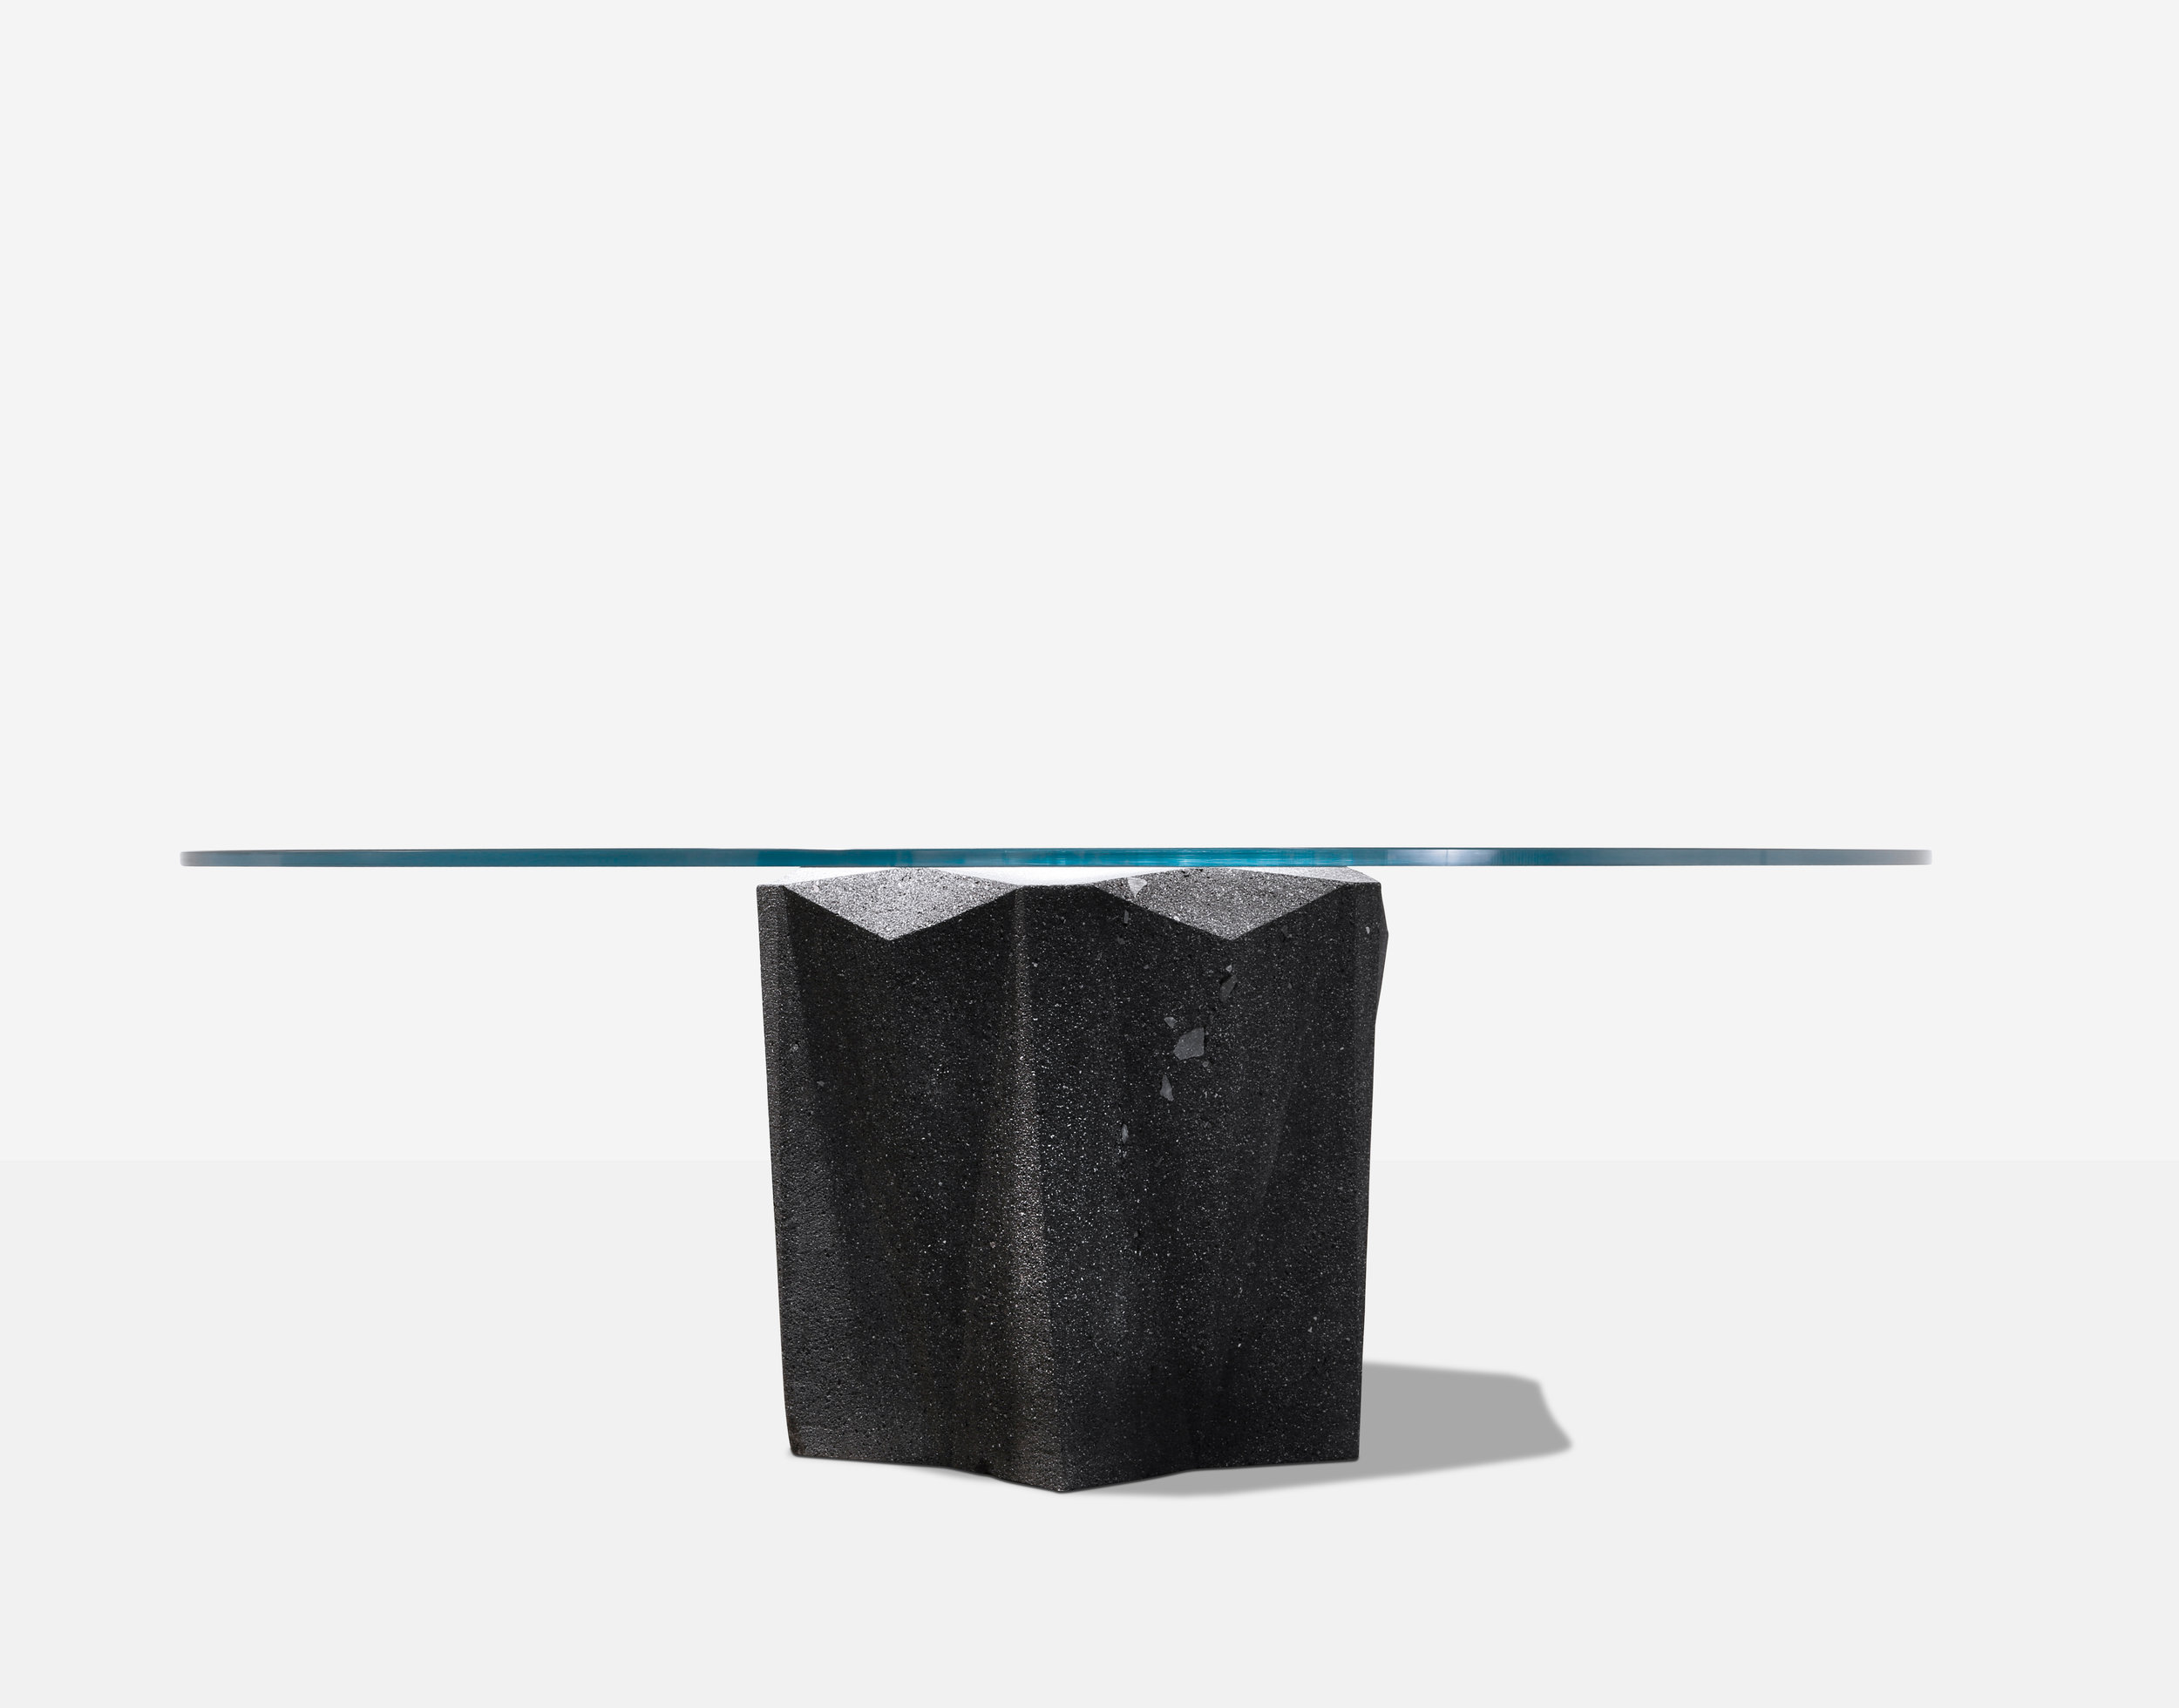 Luteca_SH_Sexta-Dining-Table_Volcanic-Stone-Glass_F-W.jpg